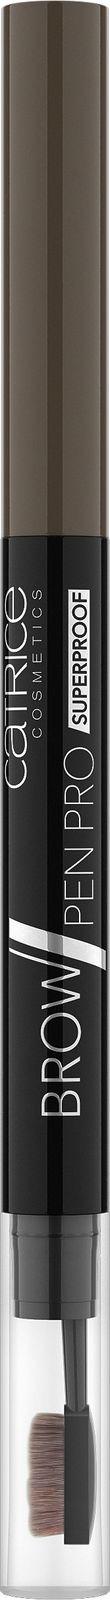 Карандаш для бровей Catrice Pen Pro, 020 Ash Brown